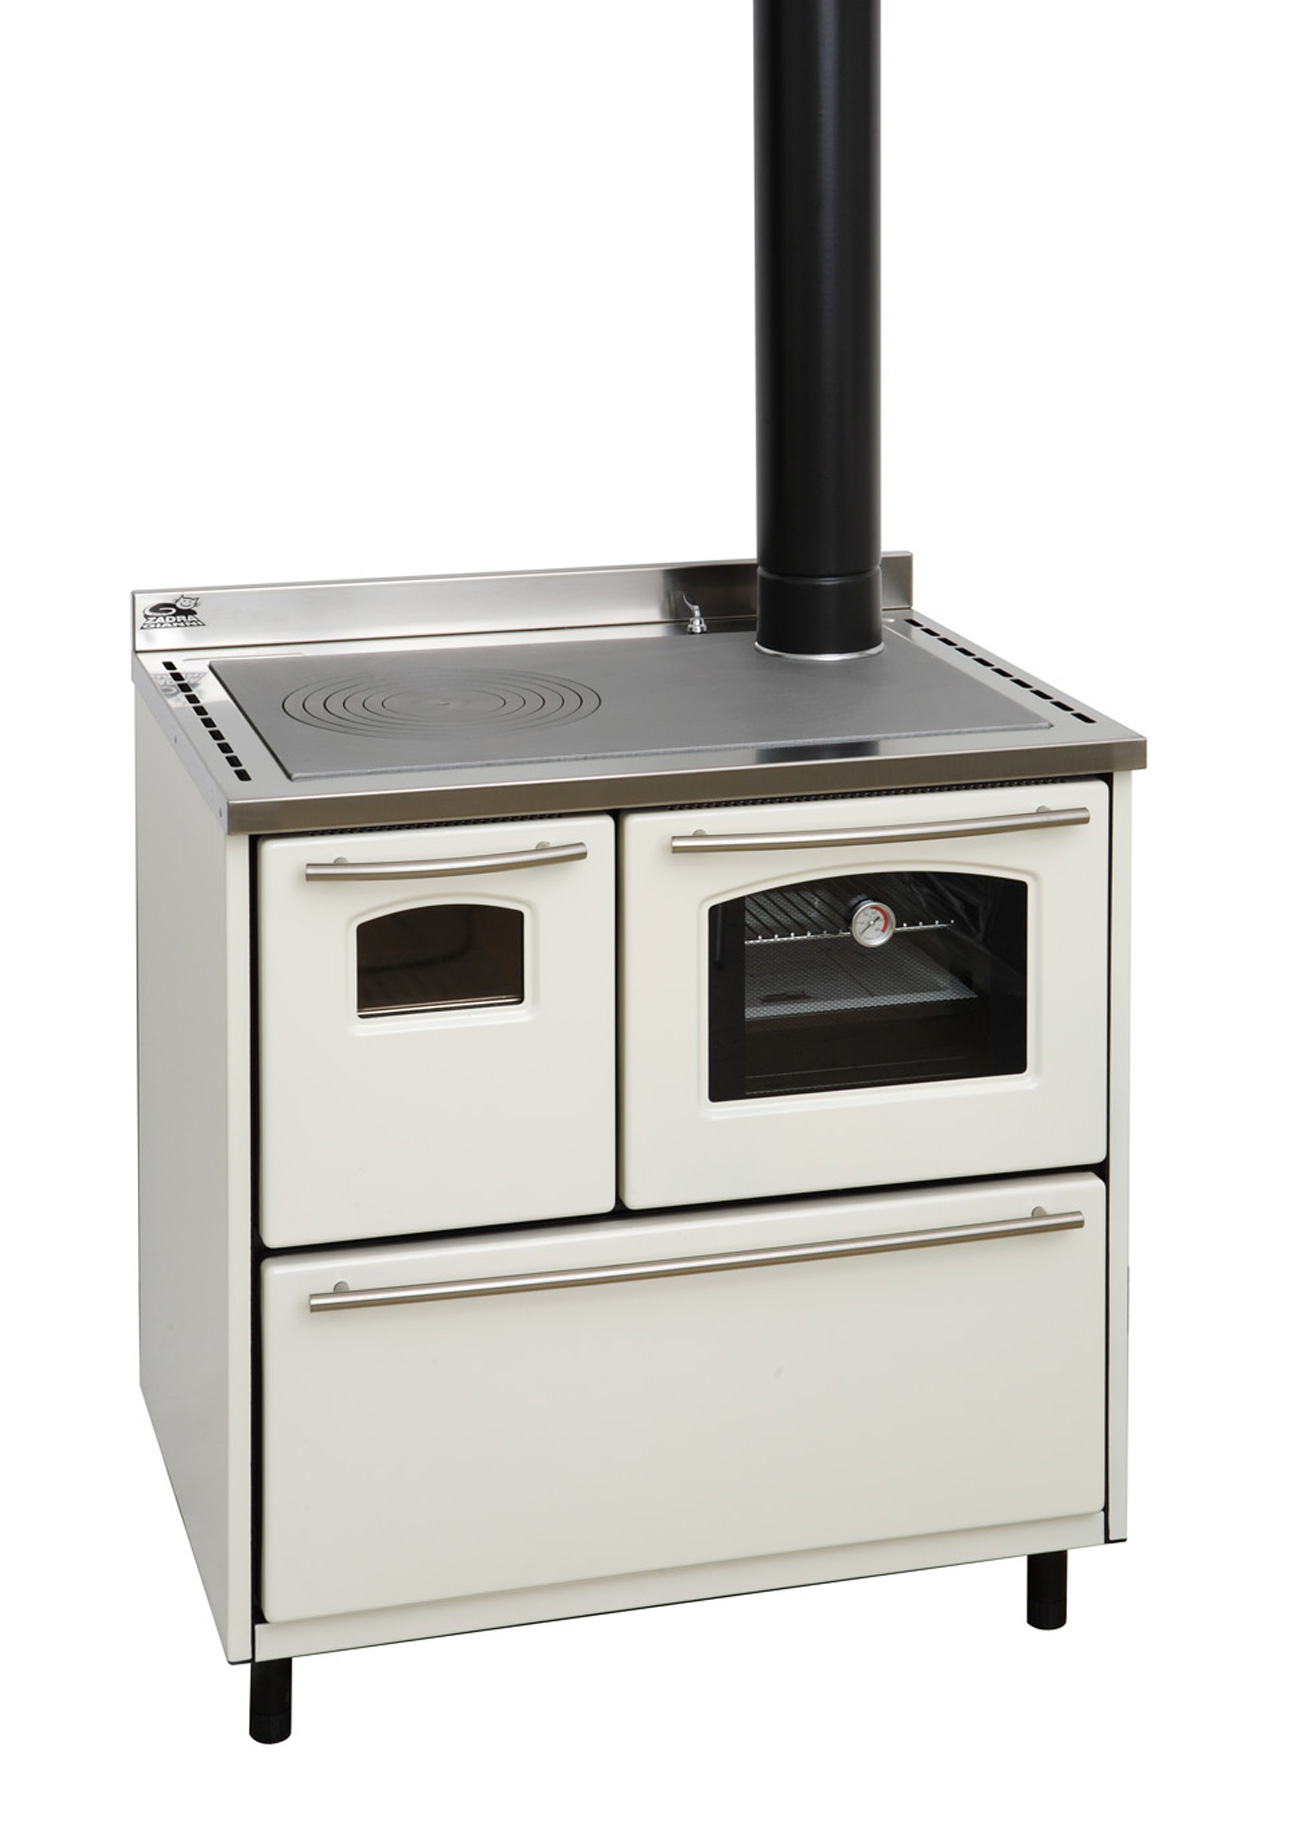 Cucine a legna cucine stufe a legna e termocucine for Cucina economica zoppas